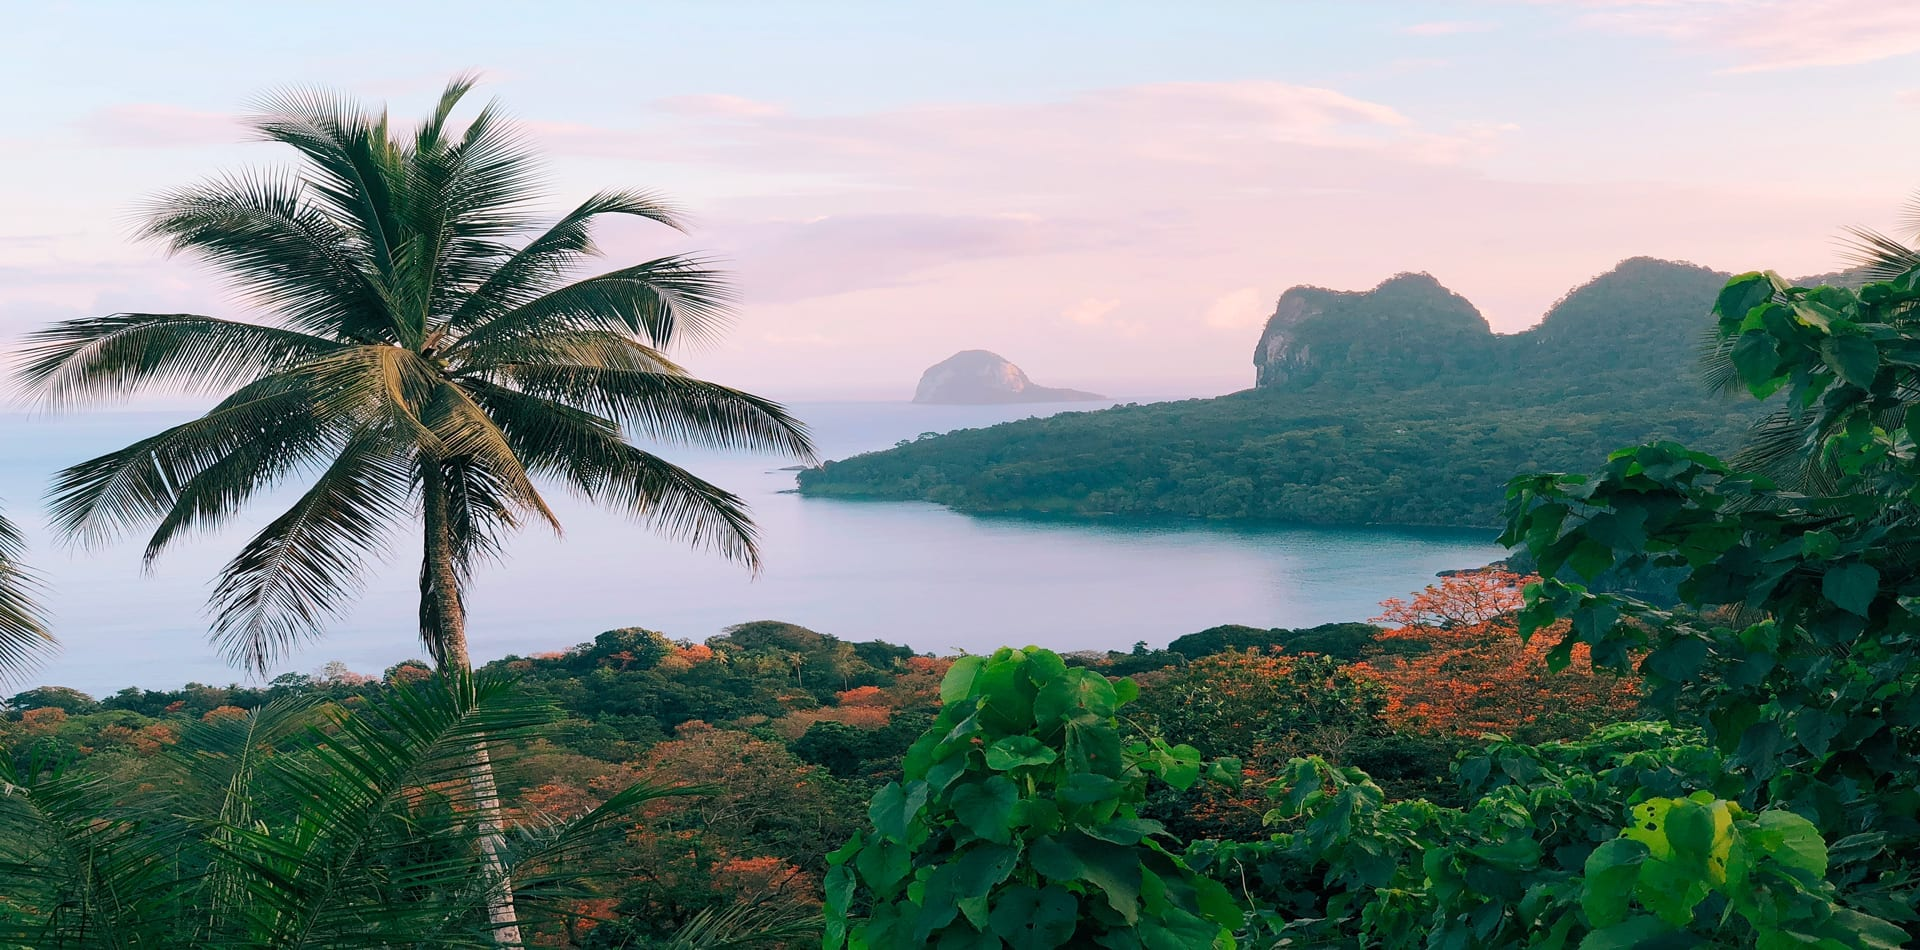 Sao Tome And Principe ocean and jungle